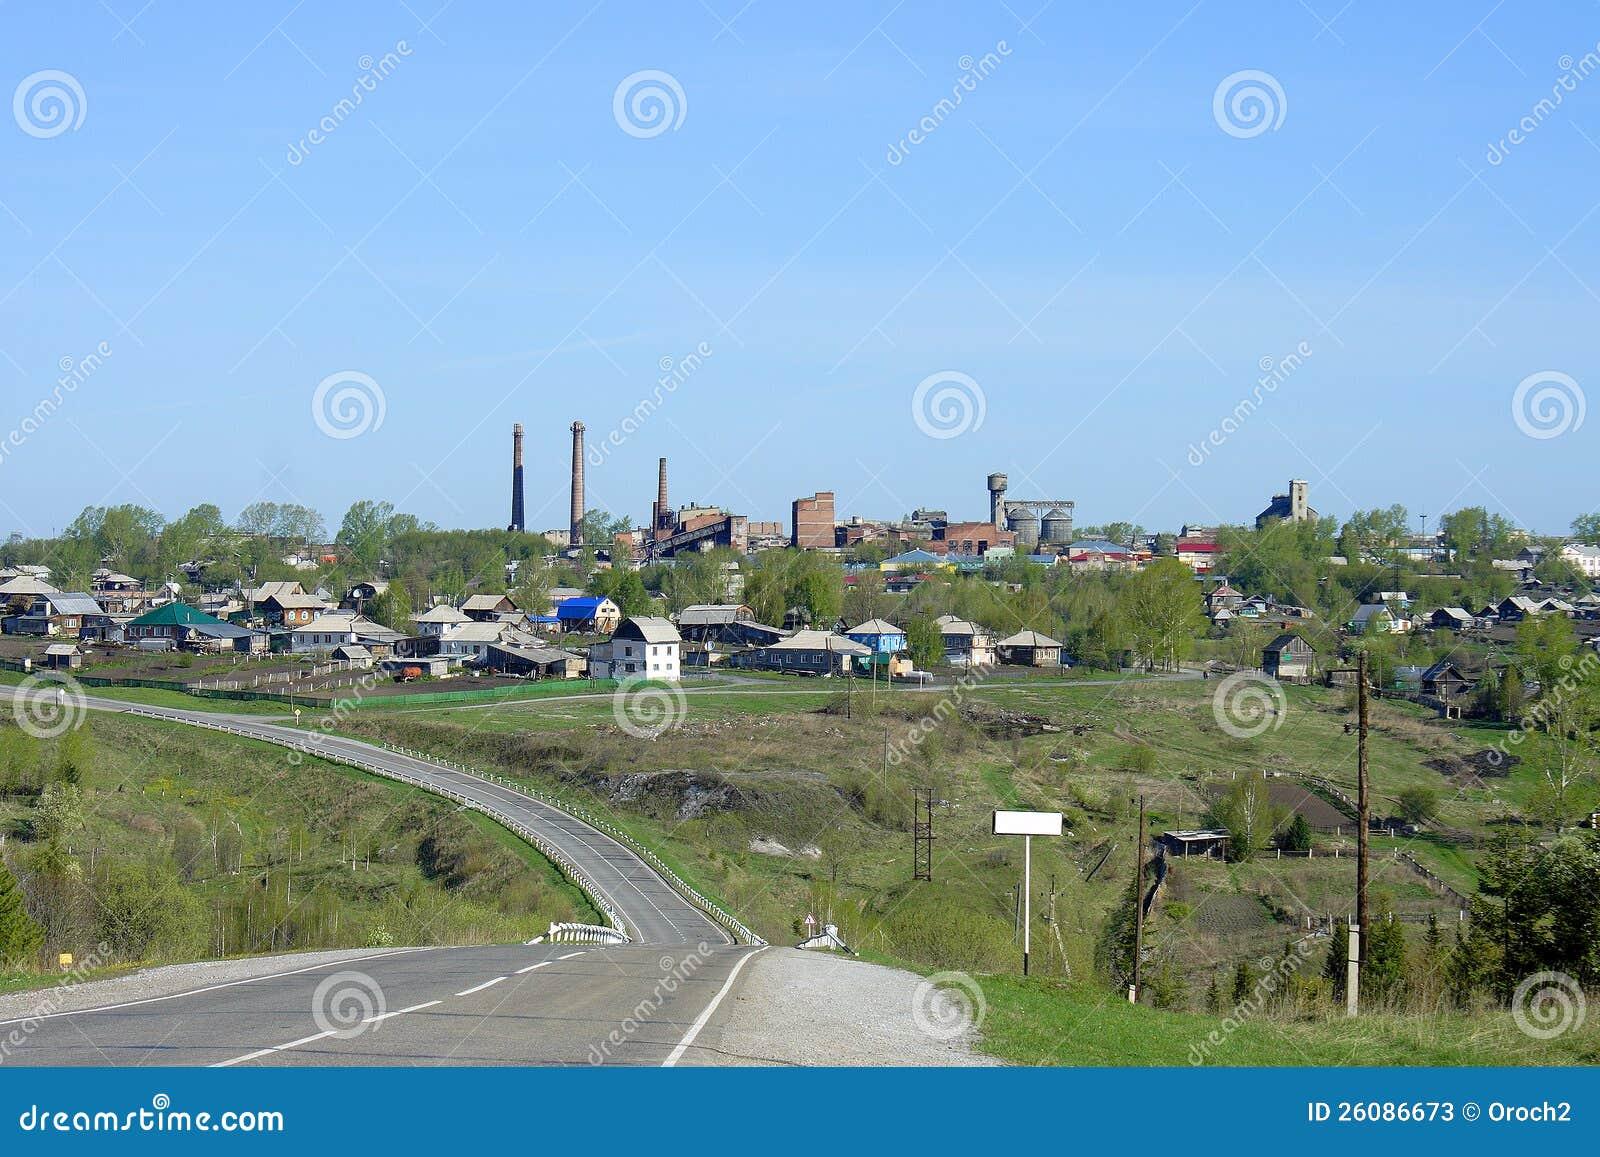 Yashkino A City In The Kemerovo